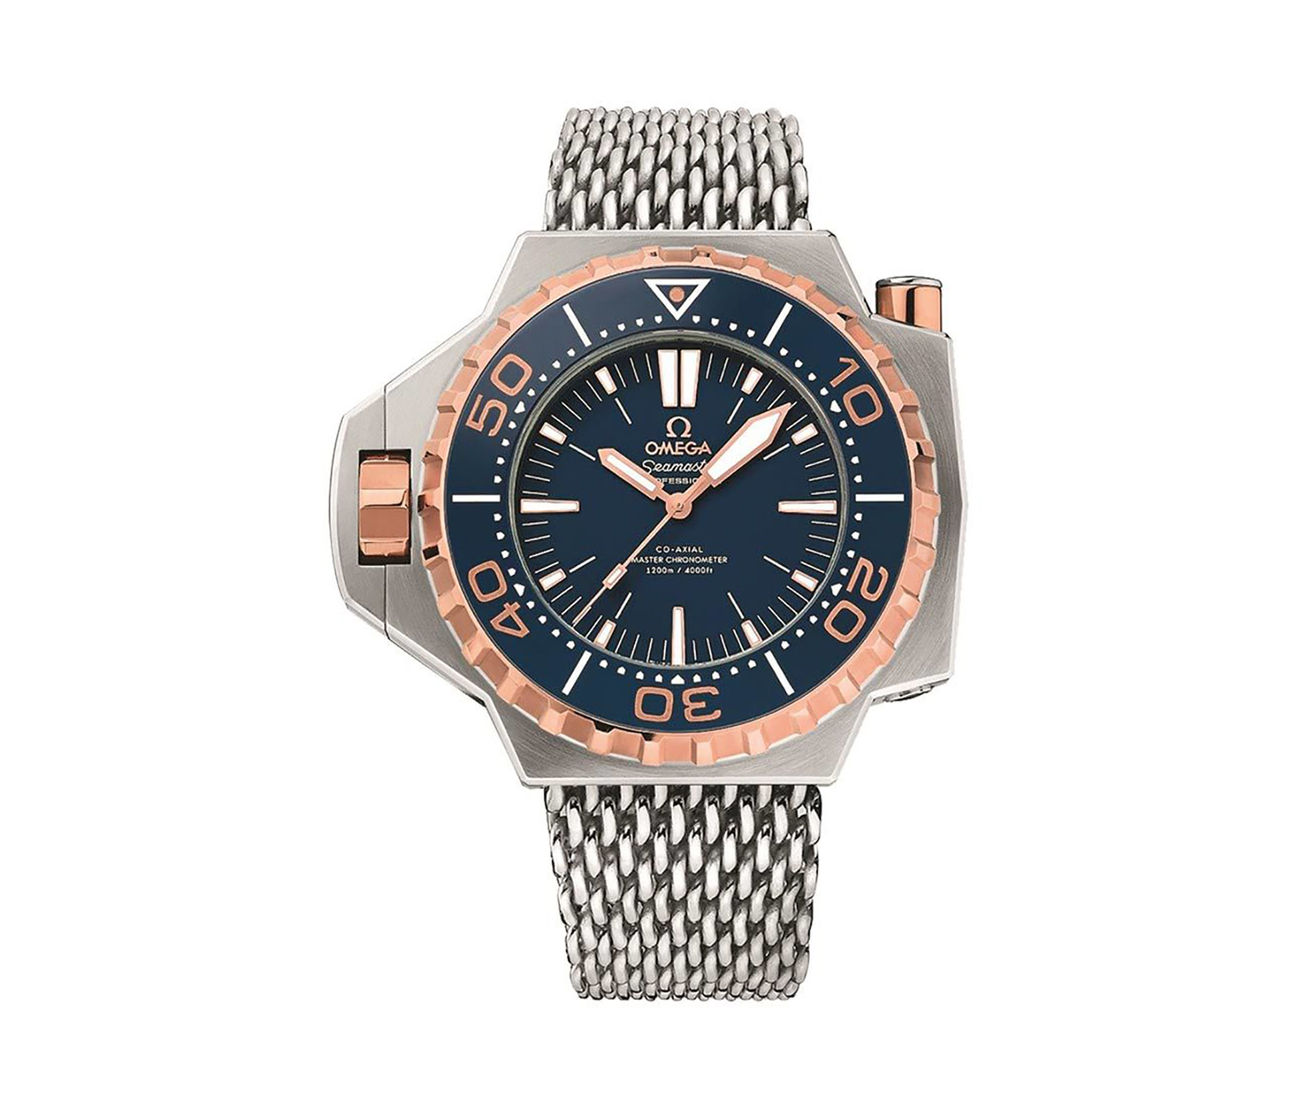 Seamaster Ploprof Co-Axial Master Chronometer